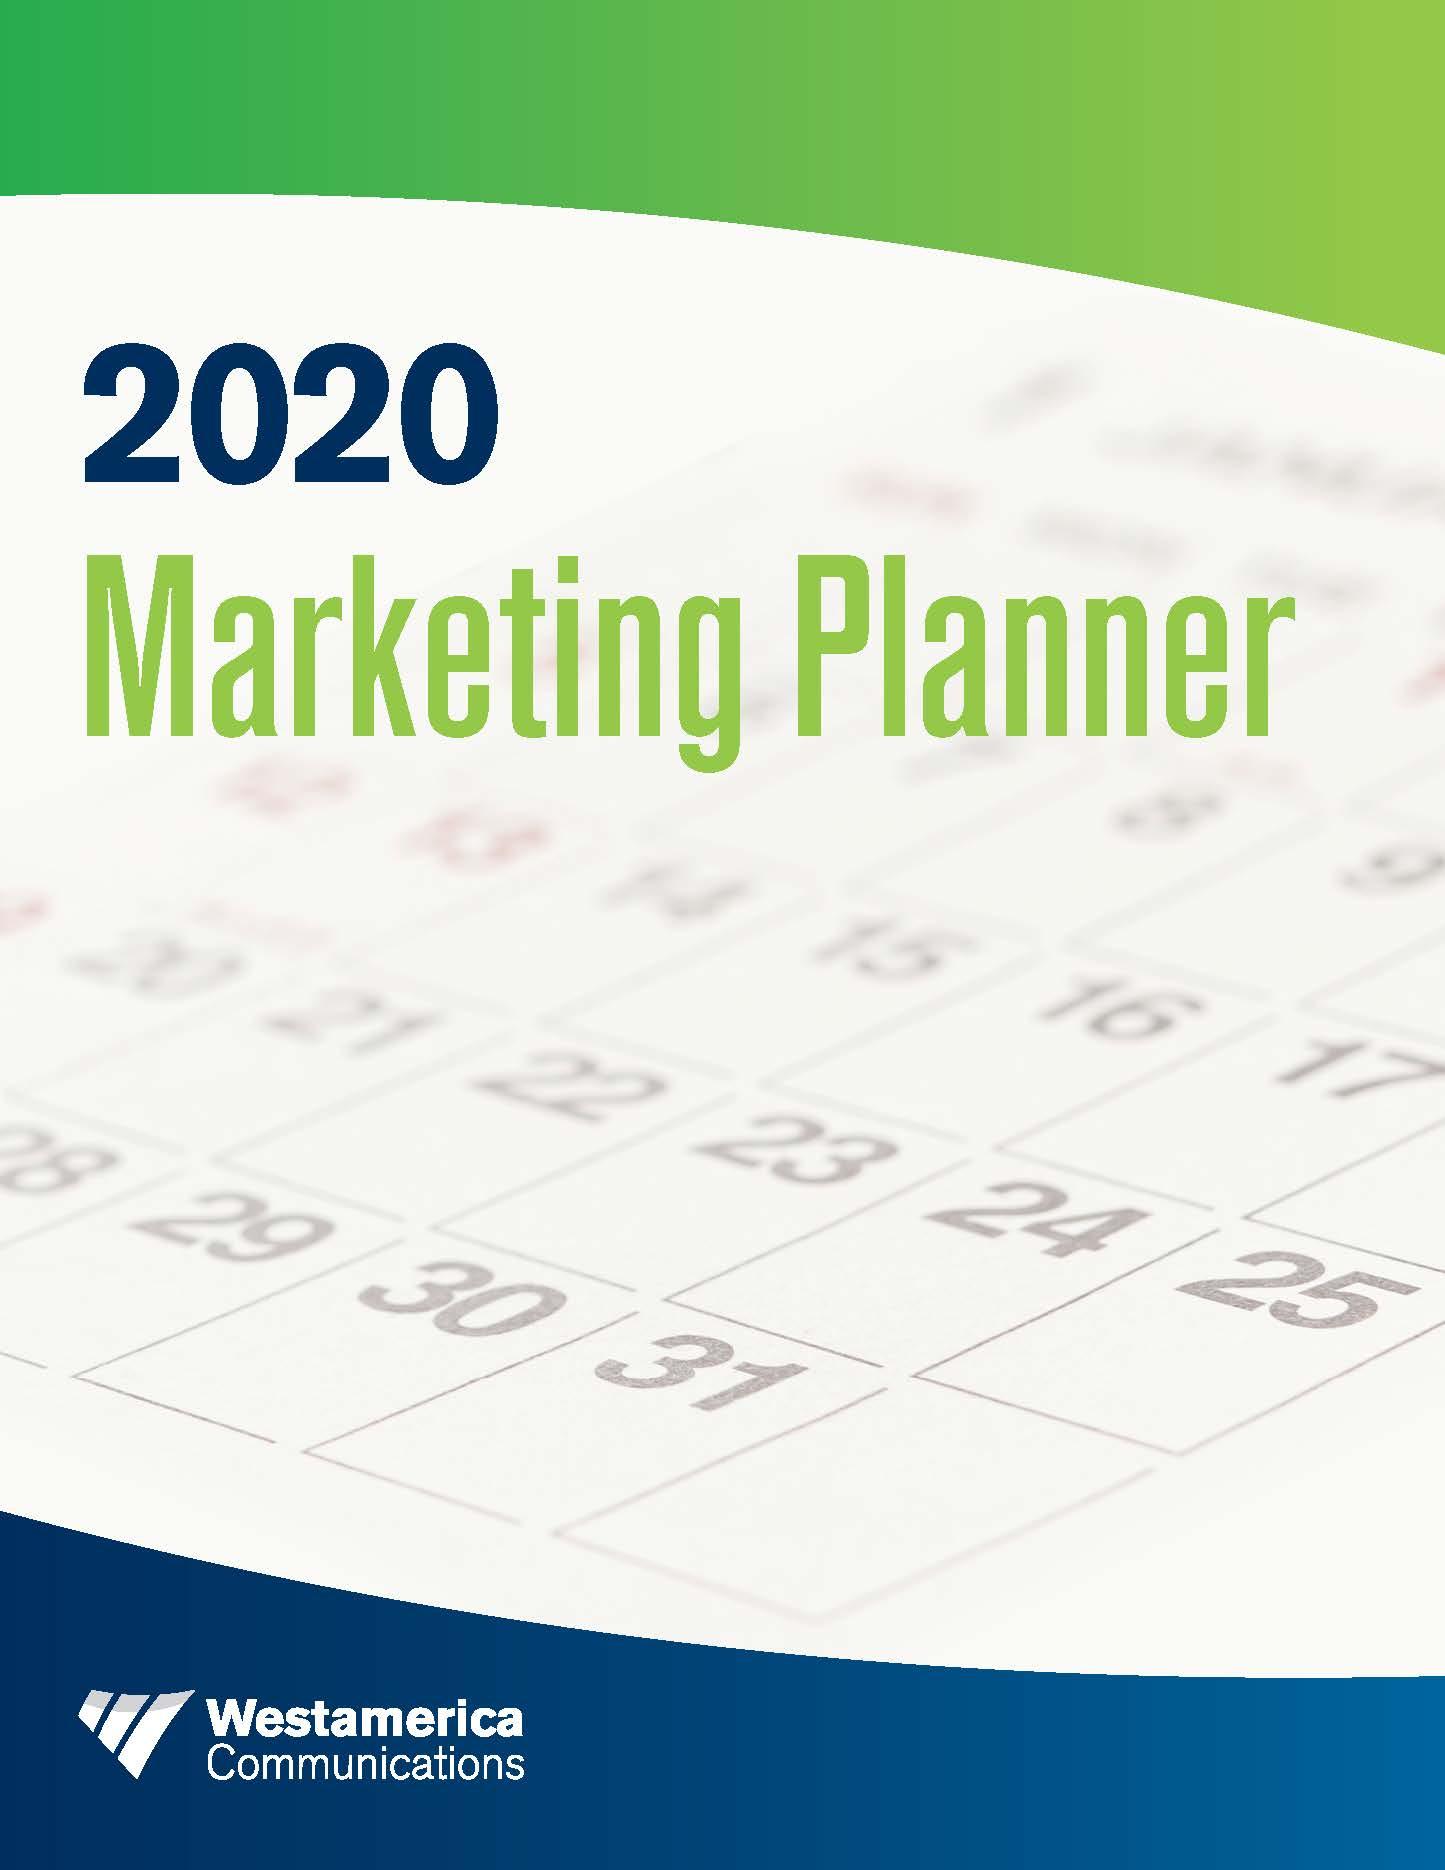 Westamerica Communications Marketing Planner